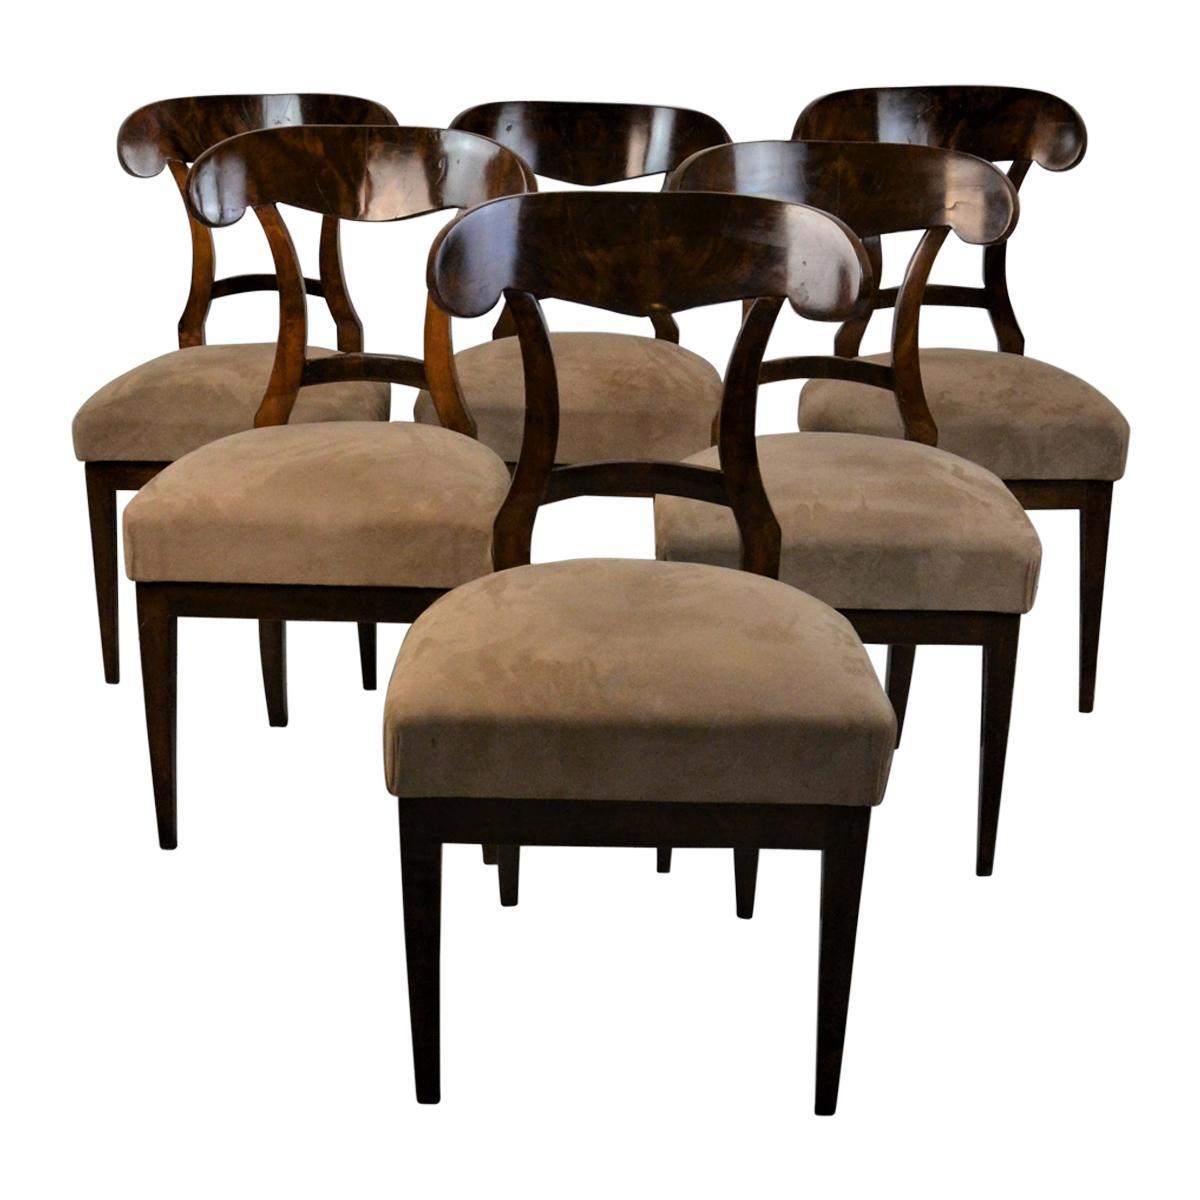 Set of 6 Mahogany Biedermeier Chairs, 19th Century